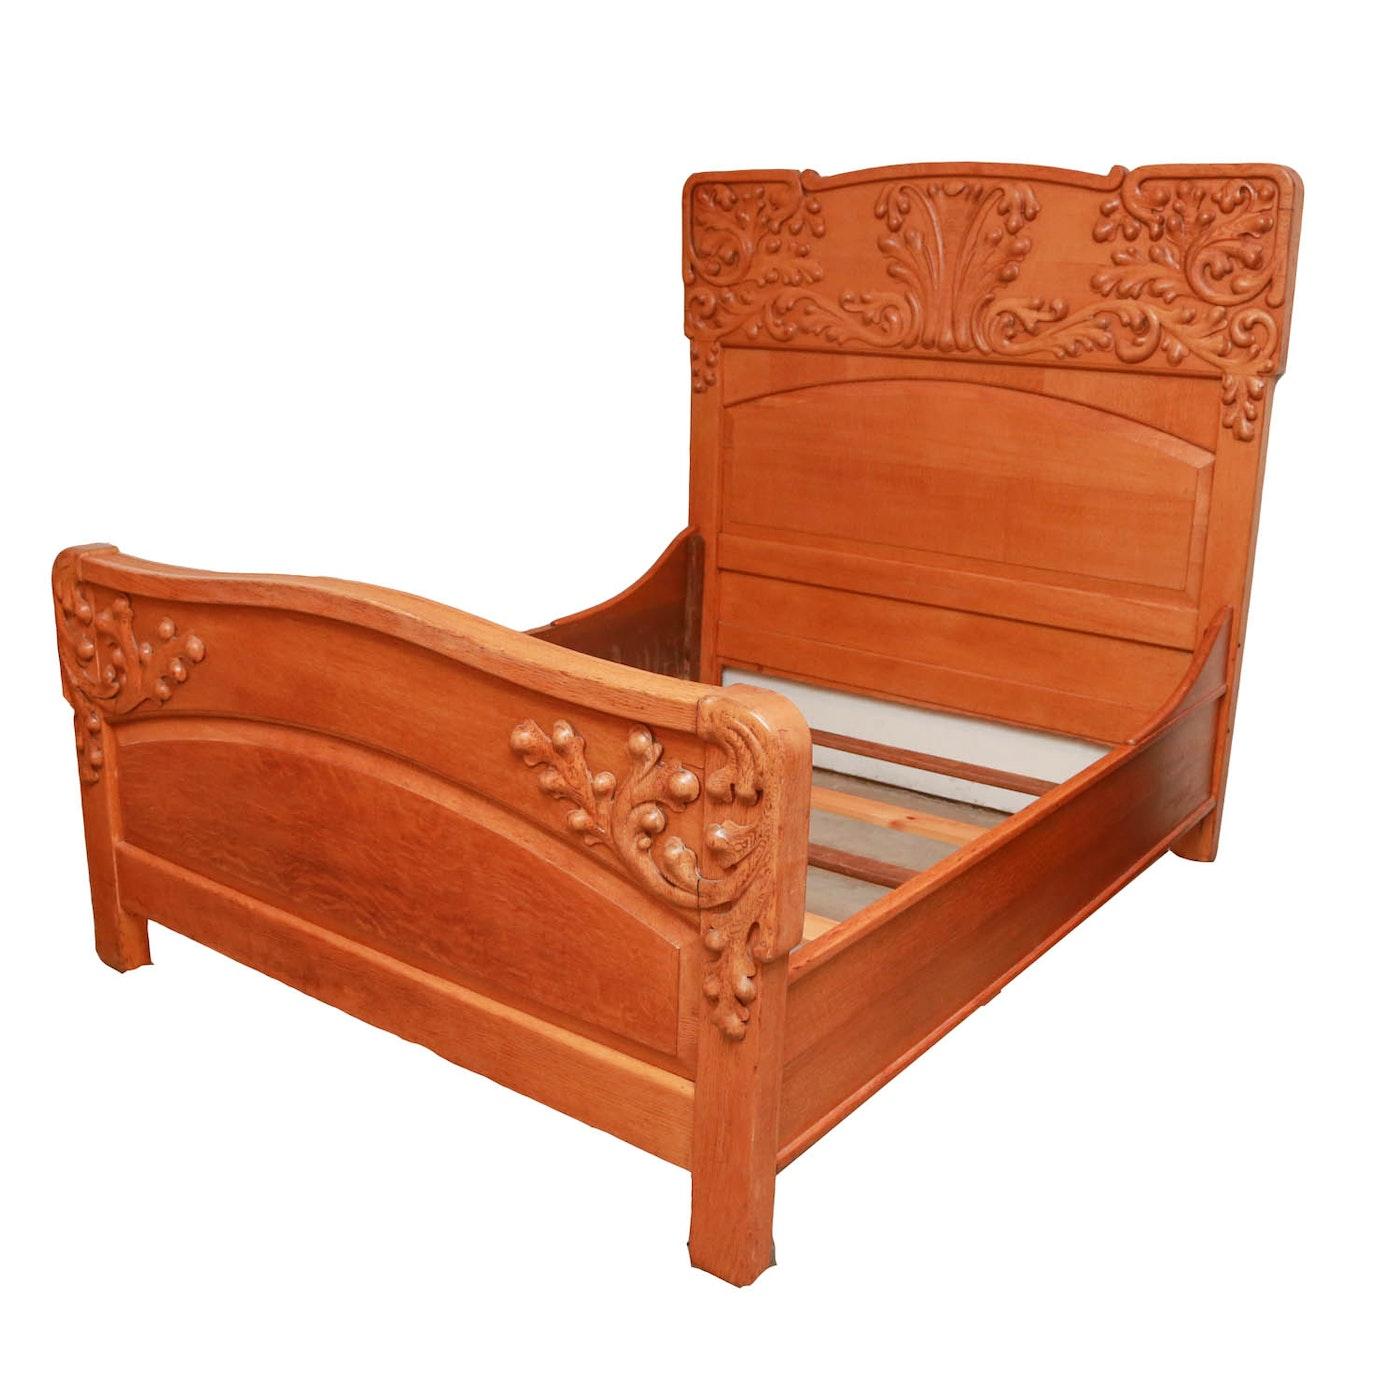 Full Bed Side Rails Fit Queen Mattress